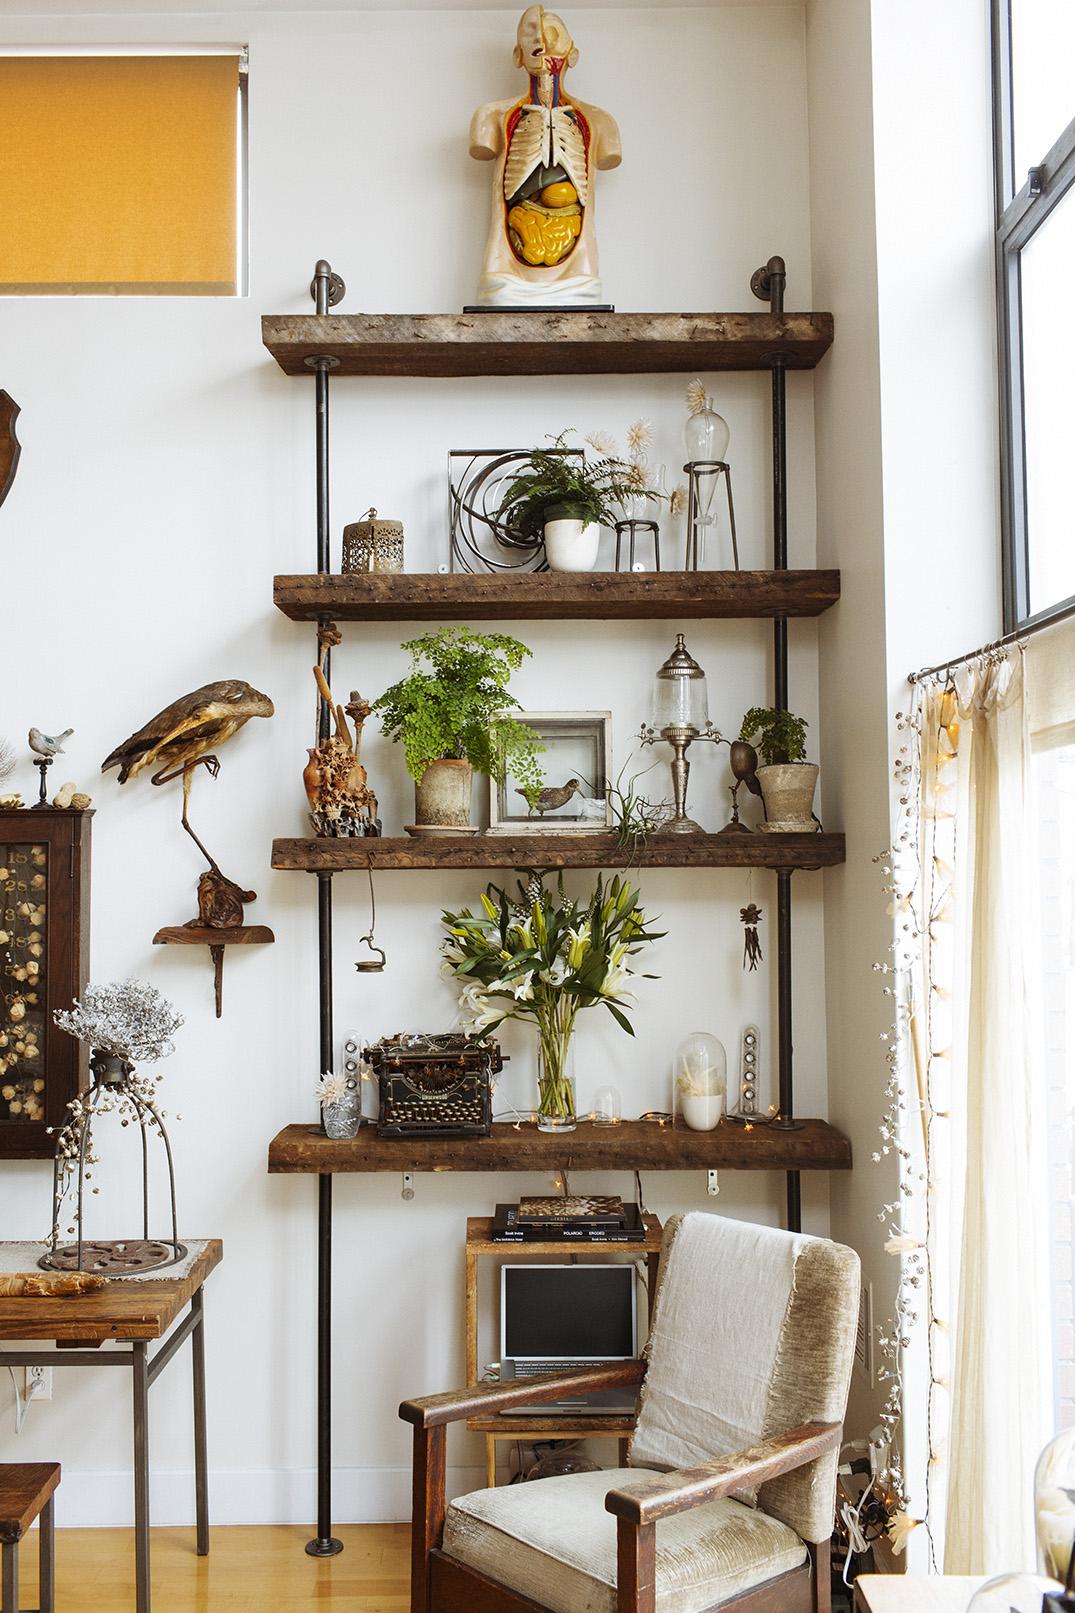 brooklyn shelves